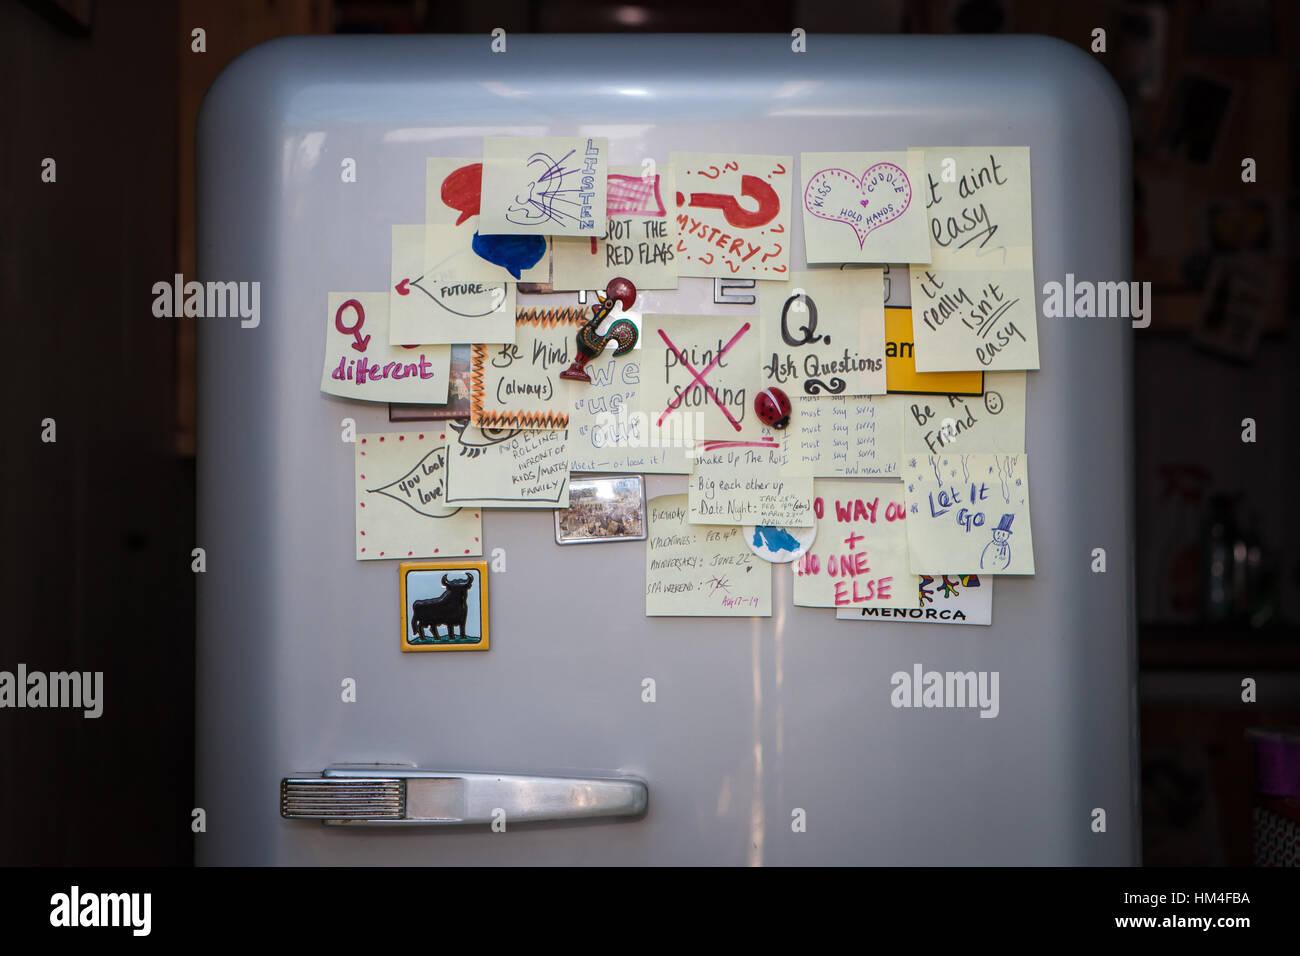 Smeg Kühlschrank Homepage : Smeg kühlschrank abgedeckt mit beziehung tipps post it stockfoto